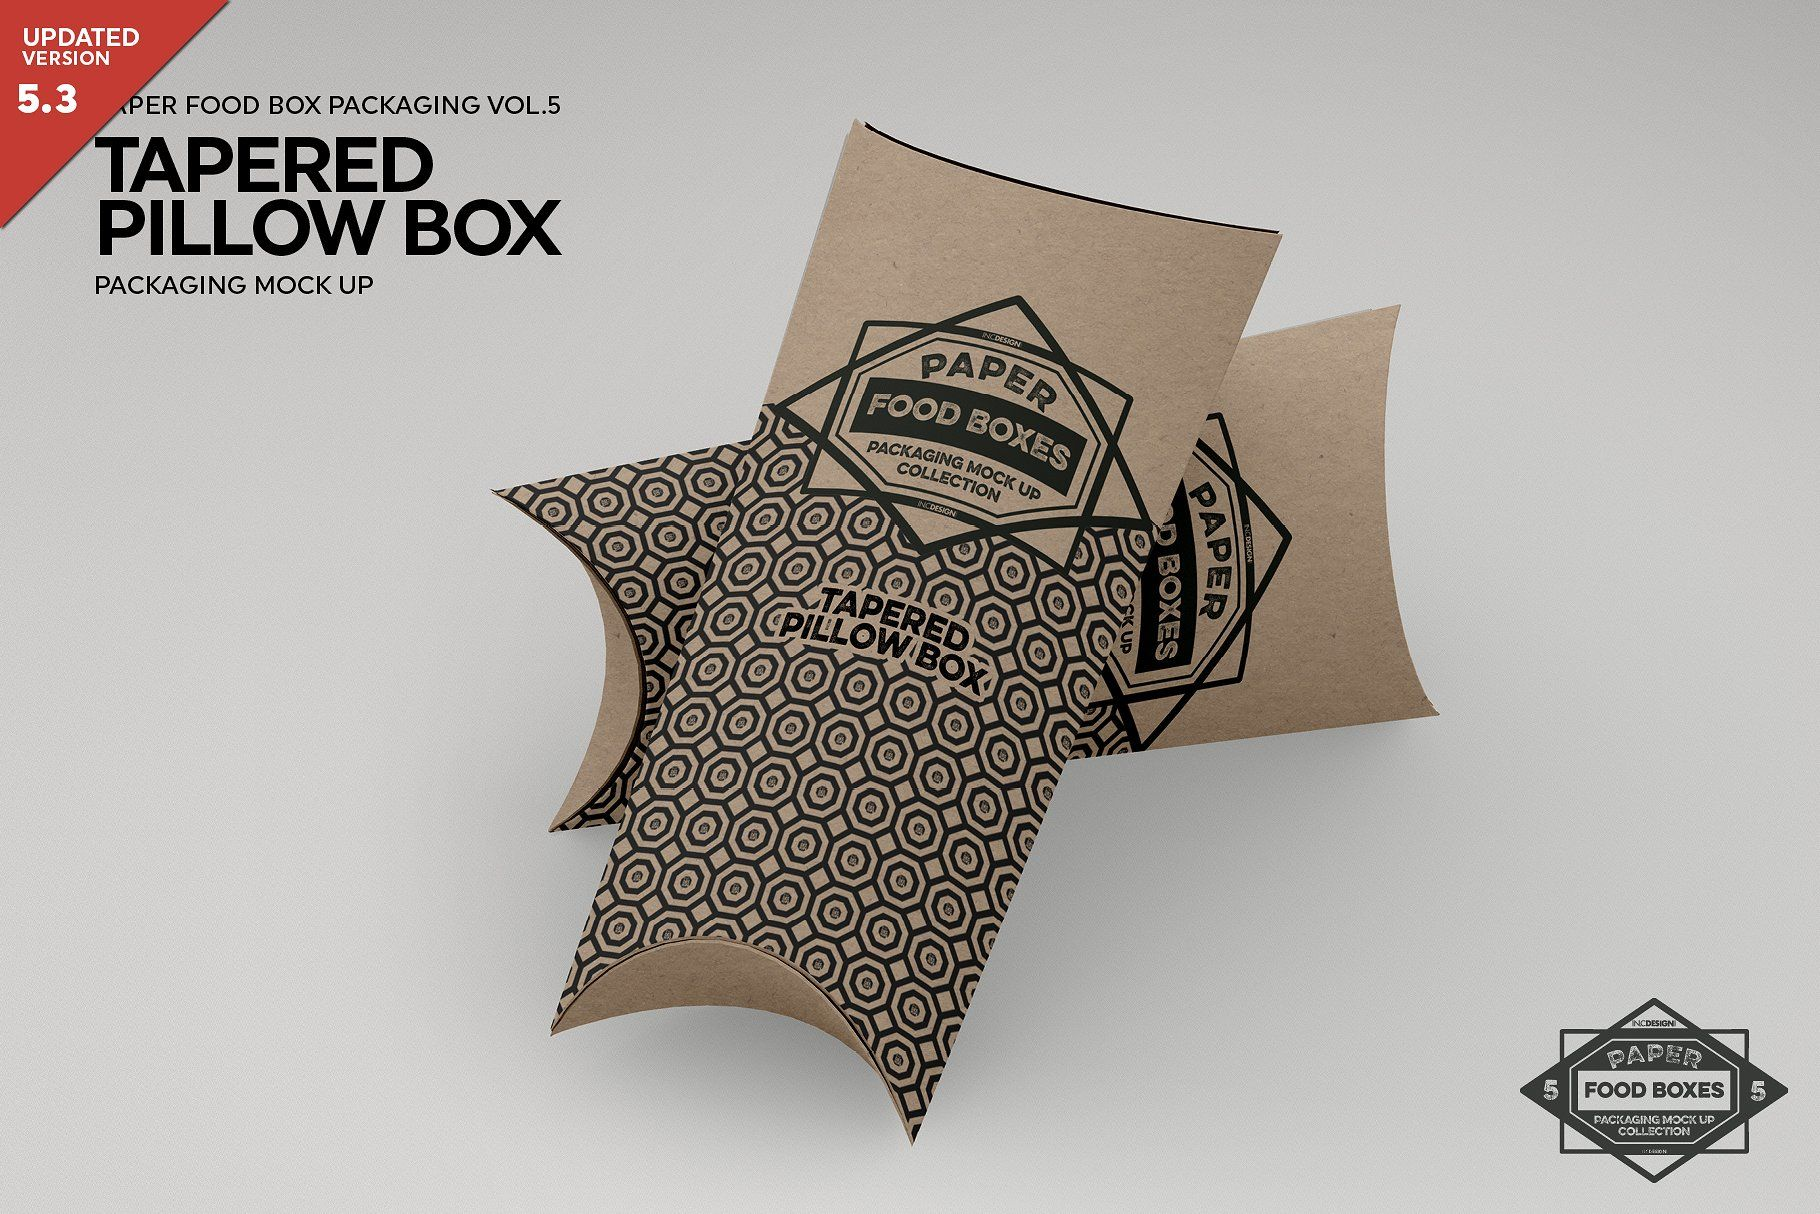 Tapered Pillow Box Packaging Mockup Food Box Packaging Packaging Mockup Box Packaging